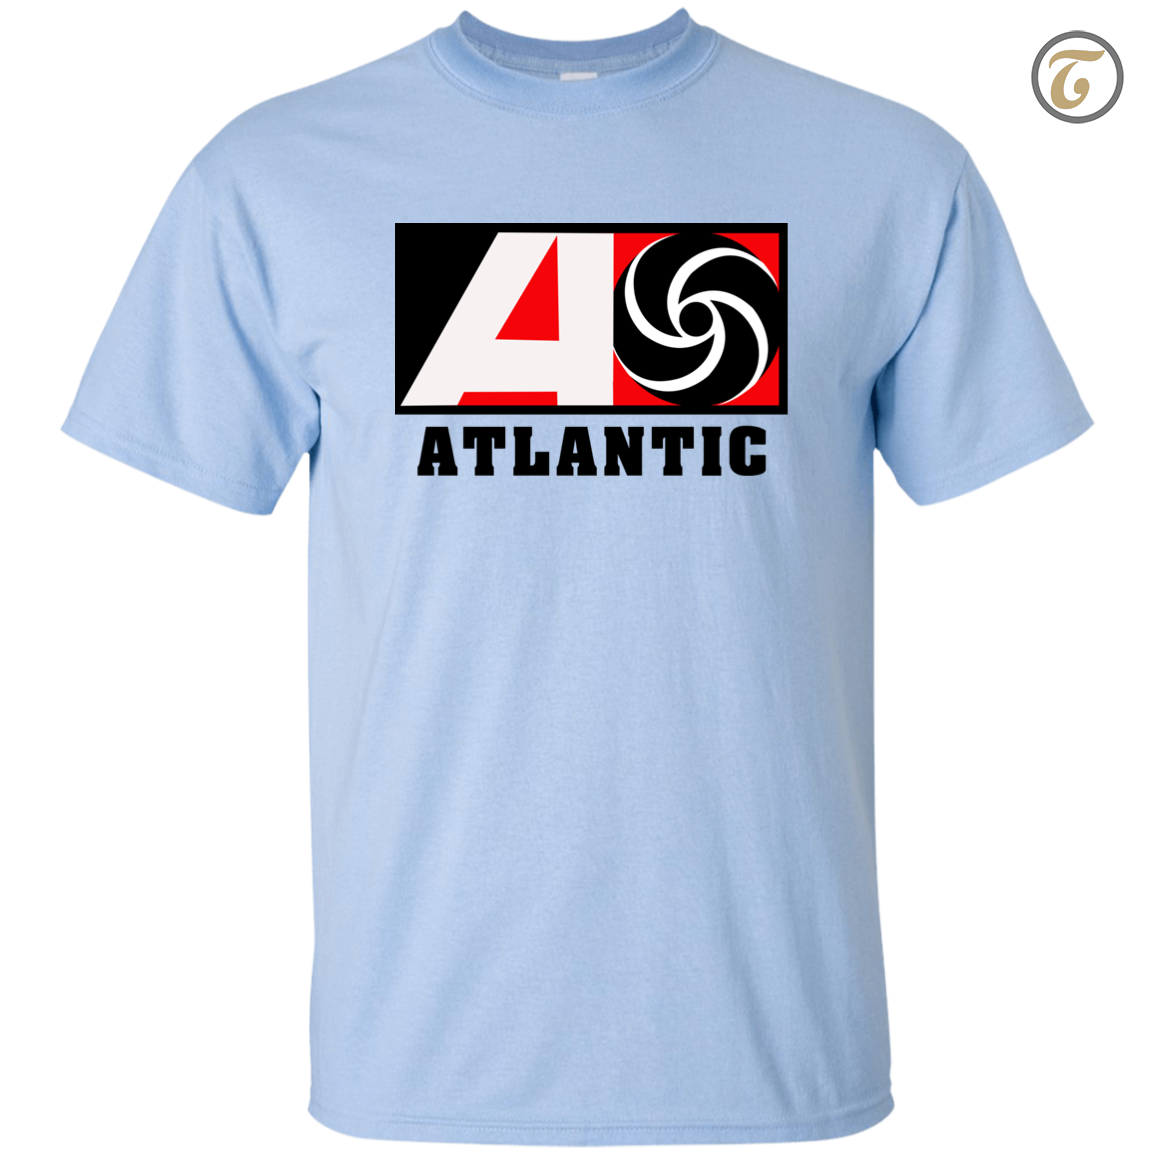 Atlantic Records Record Label Men T-Shirt - Light Blue